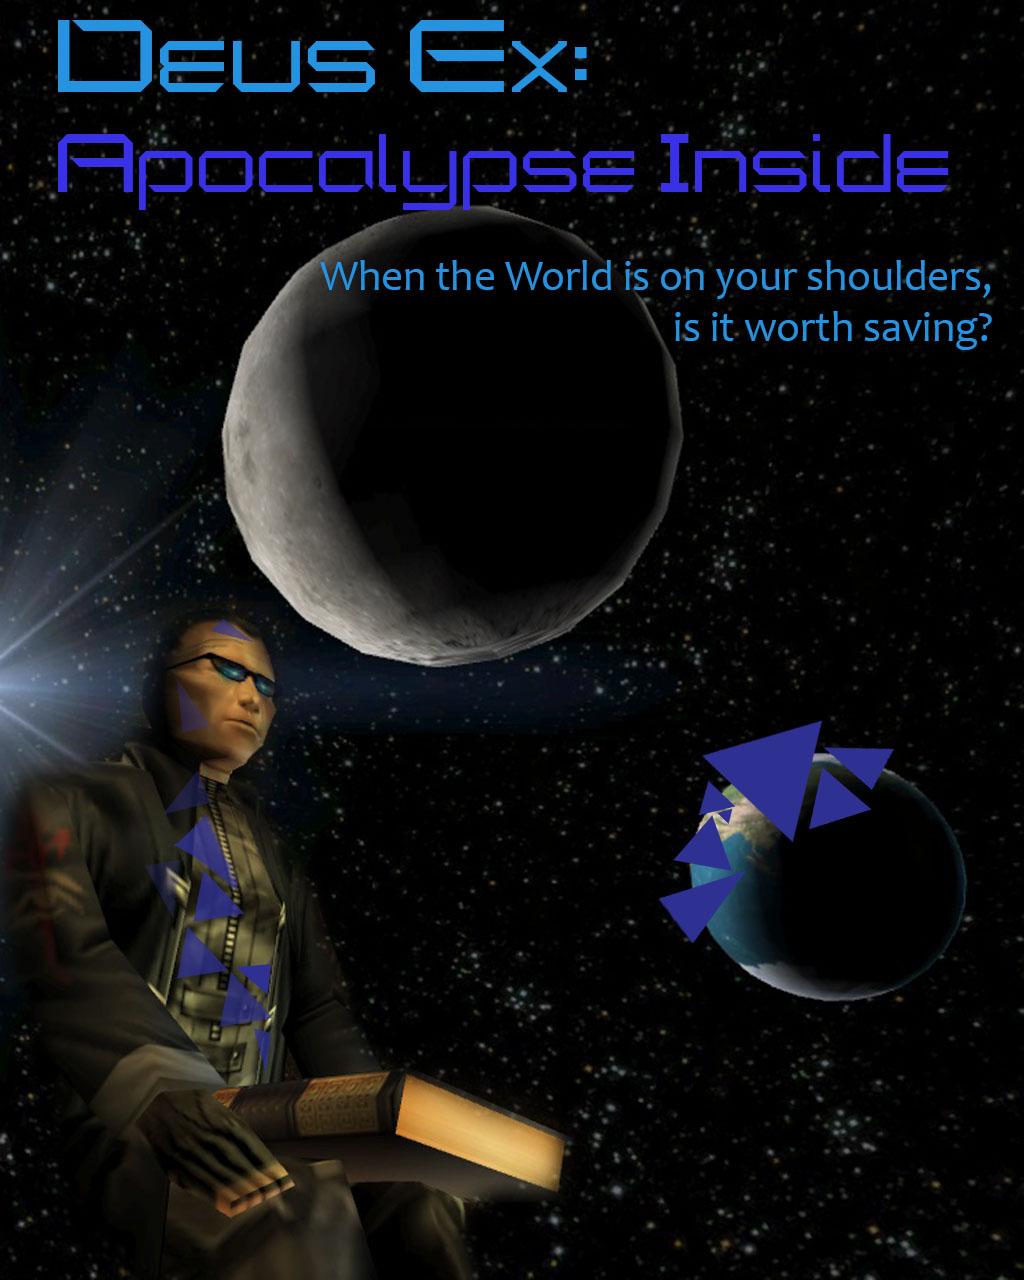 Deus Ex Apocalypse Inside Mod Mod Db